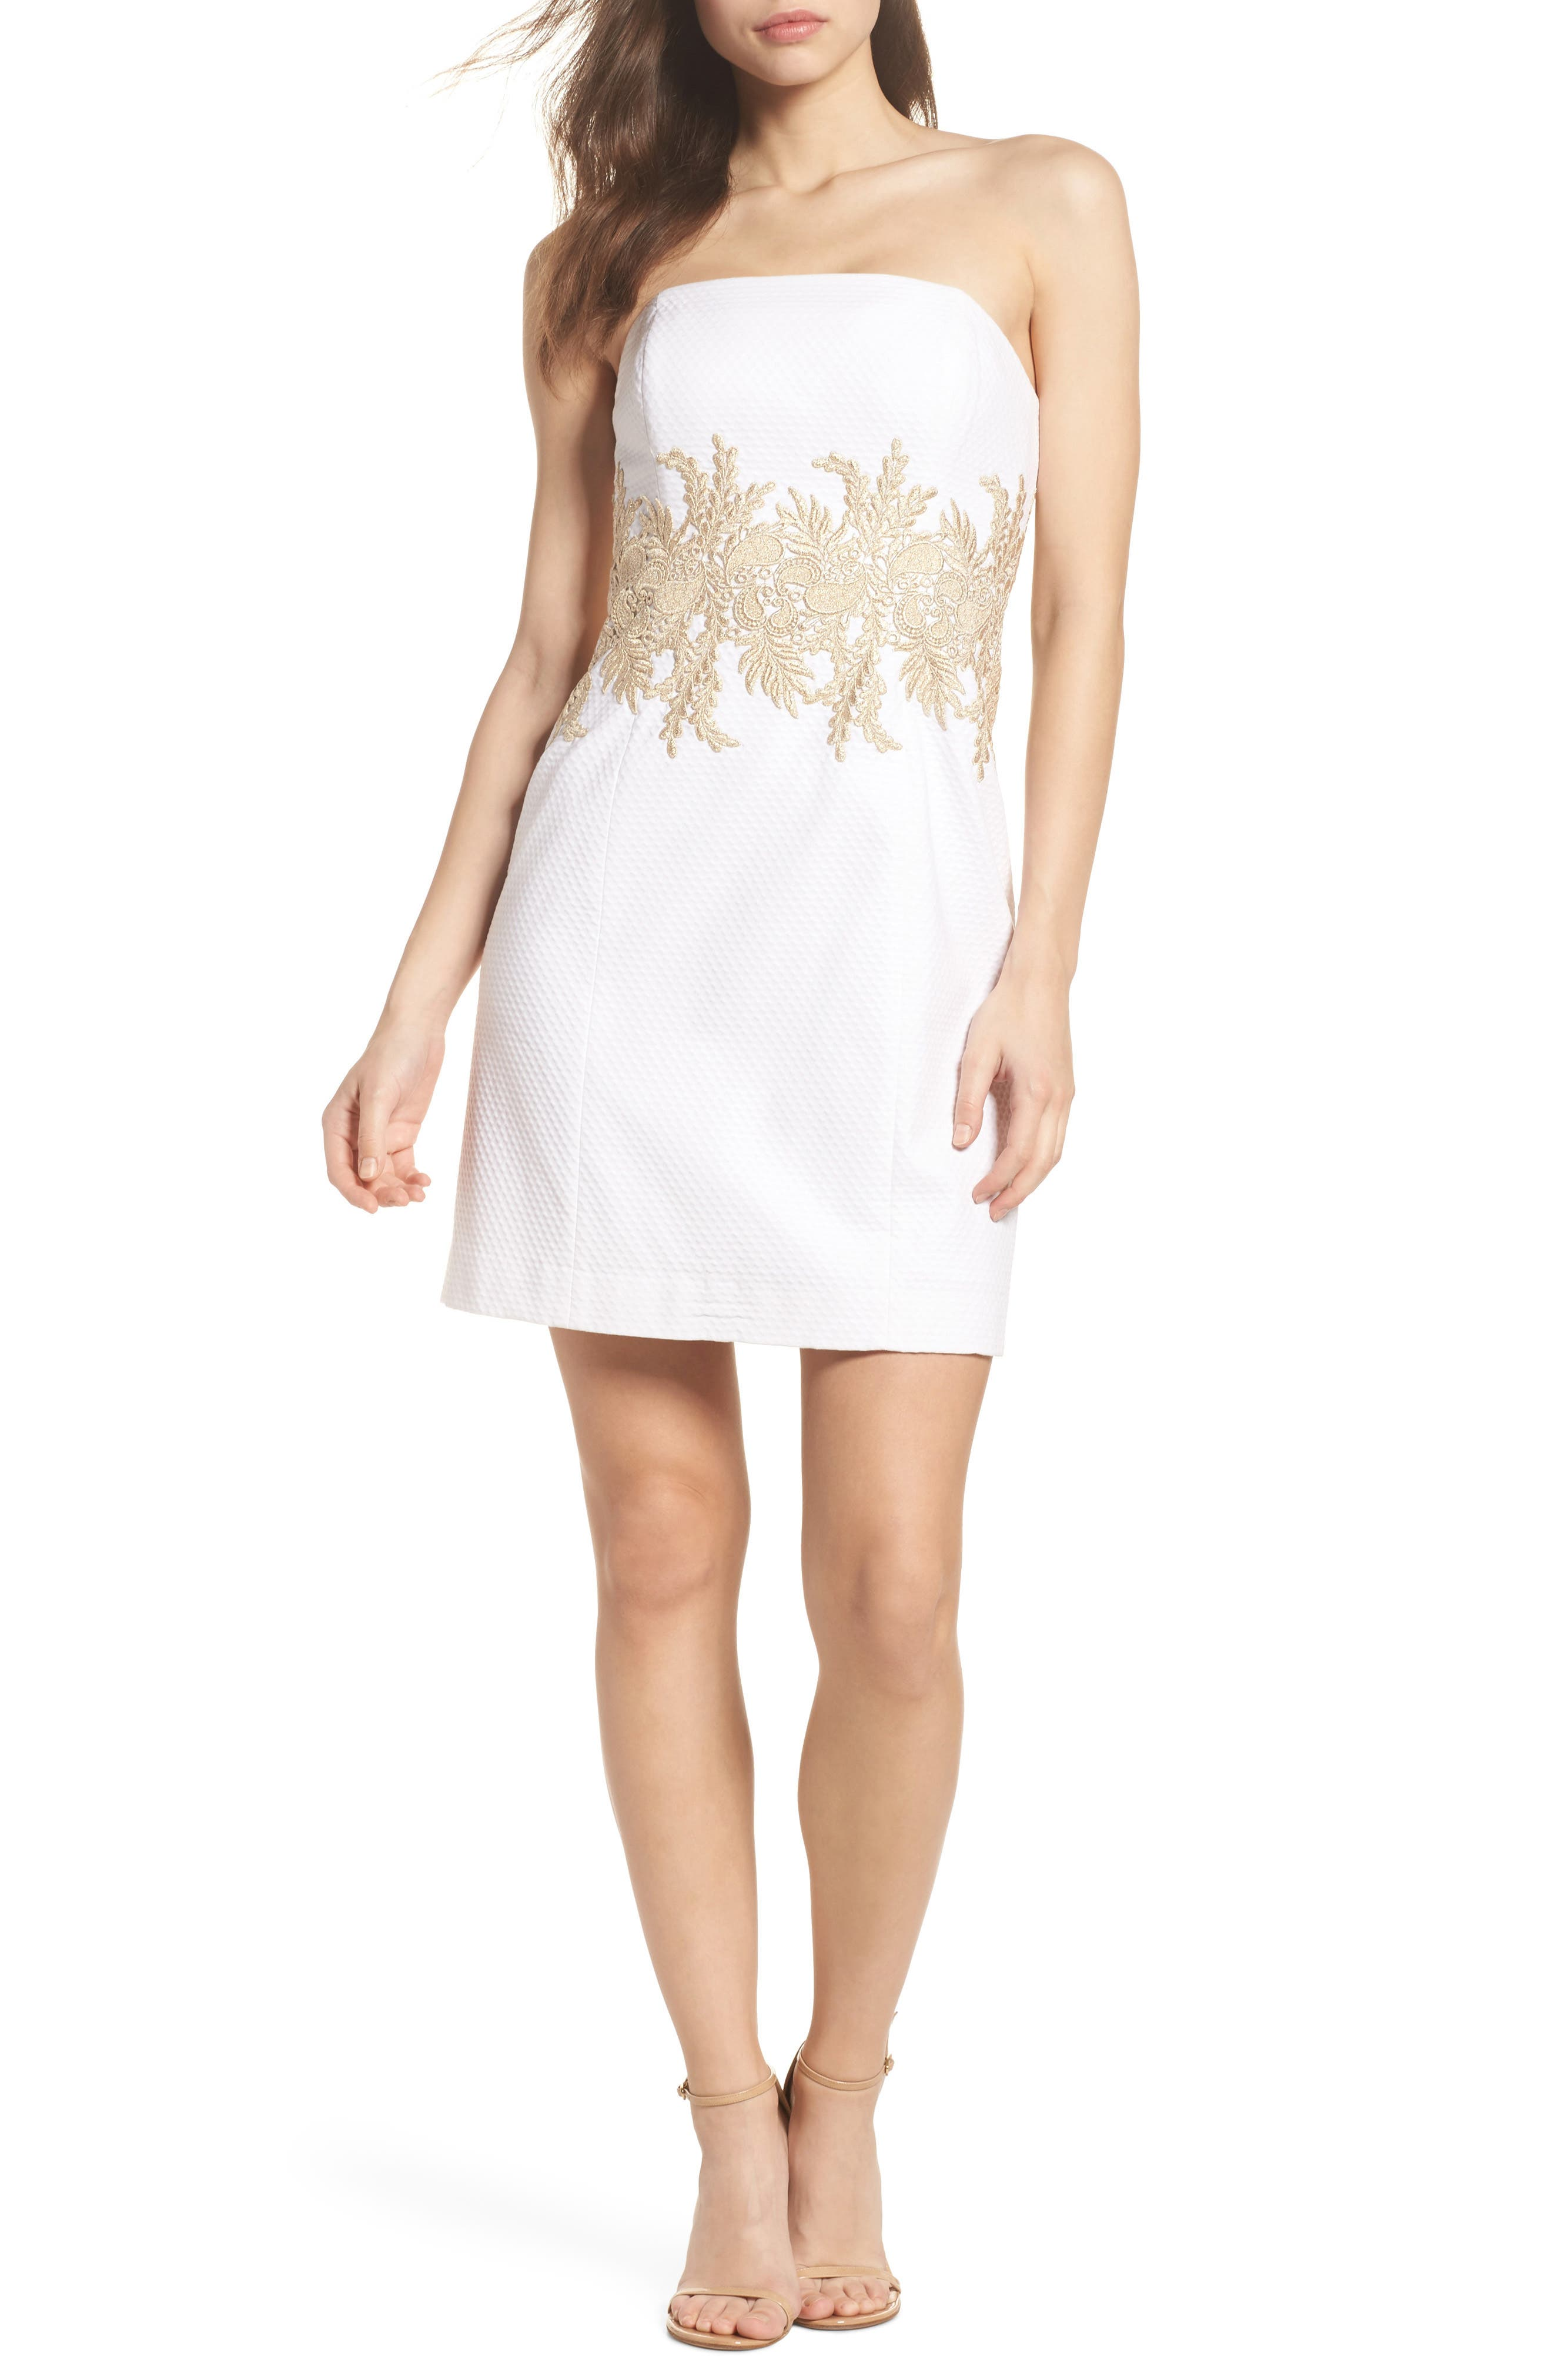 Lilly Pulitzer Kade Strapless Dress